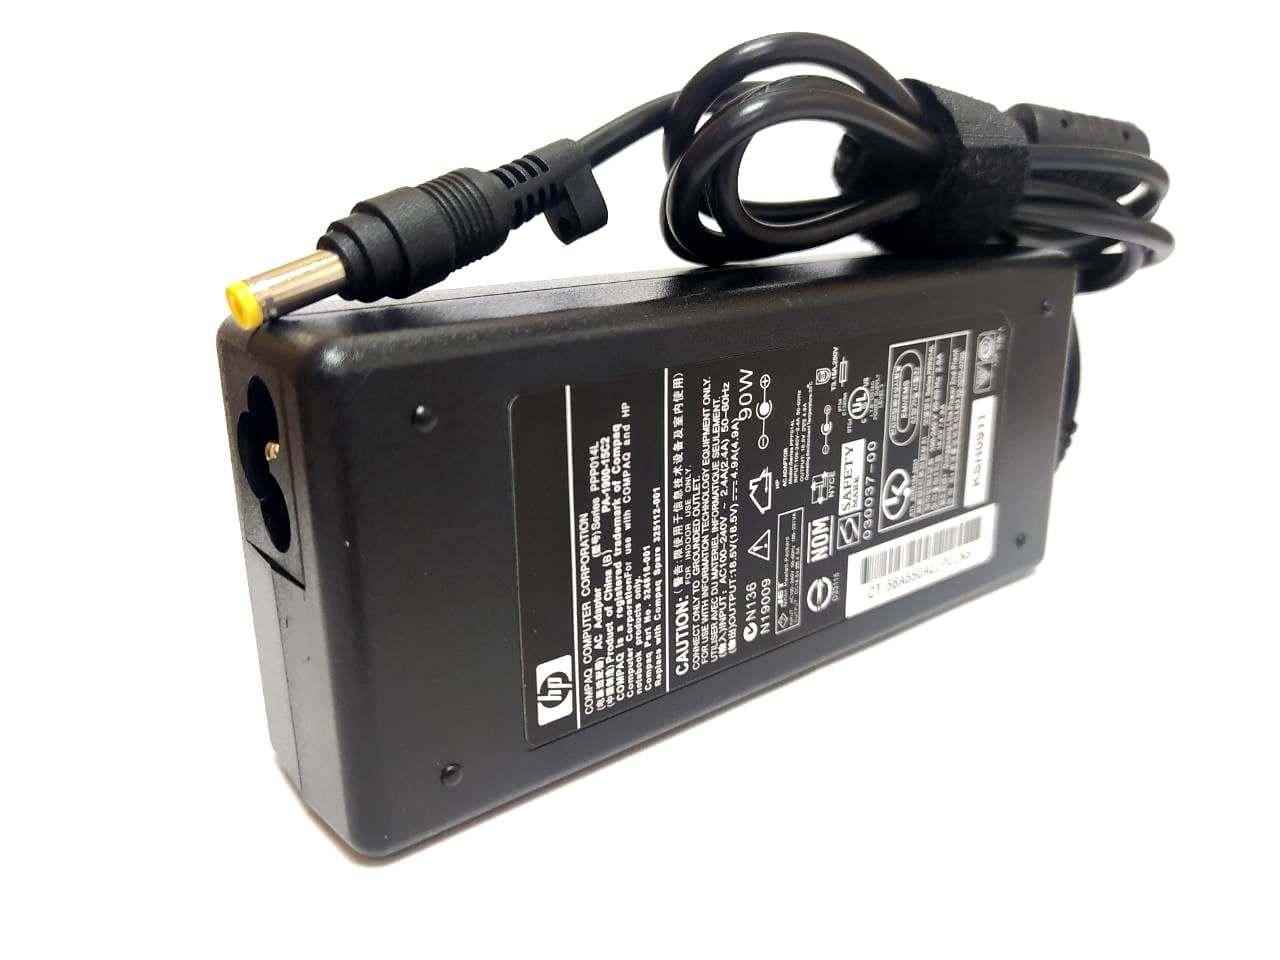 Блок питания для ноутбука HP Pavilion dv9940er 18.5V 4.9A 4.8*1.7mm 90W